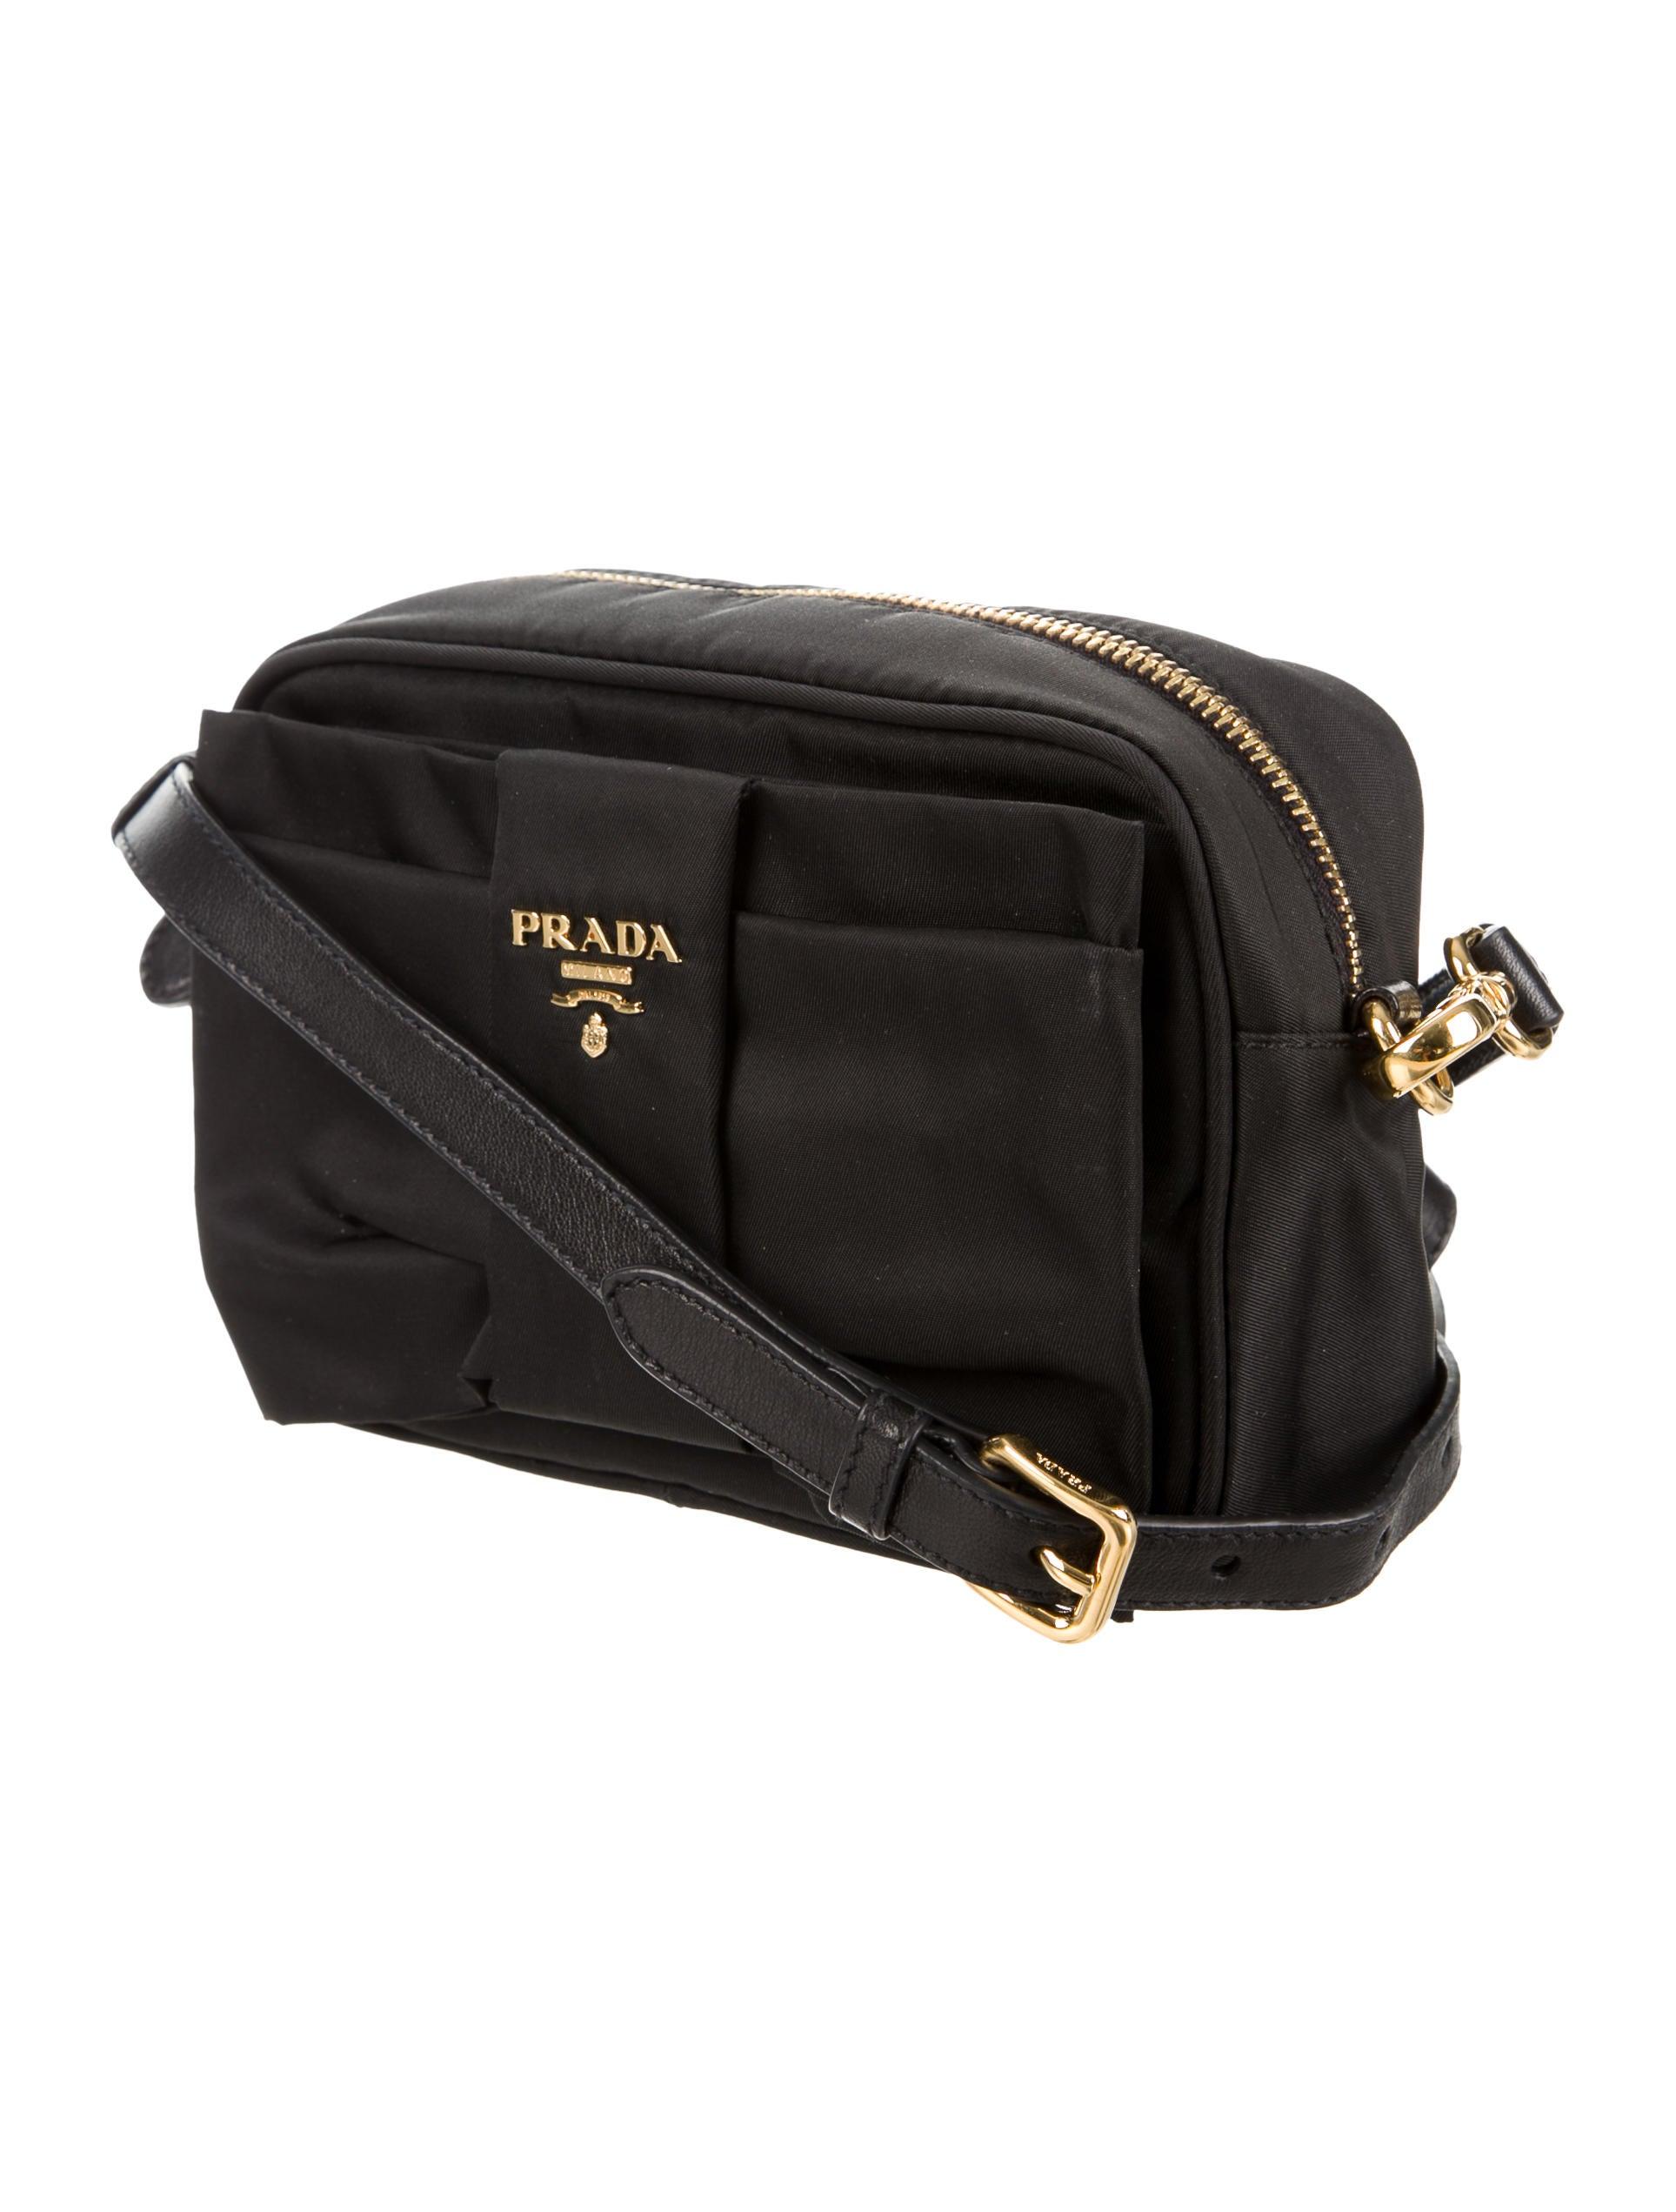 570010363735 Prada Nylon Crossbody Handbags